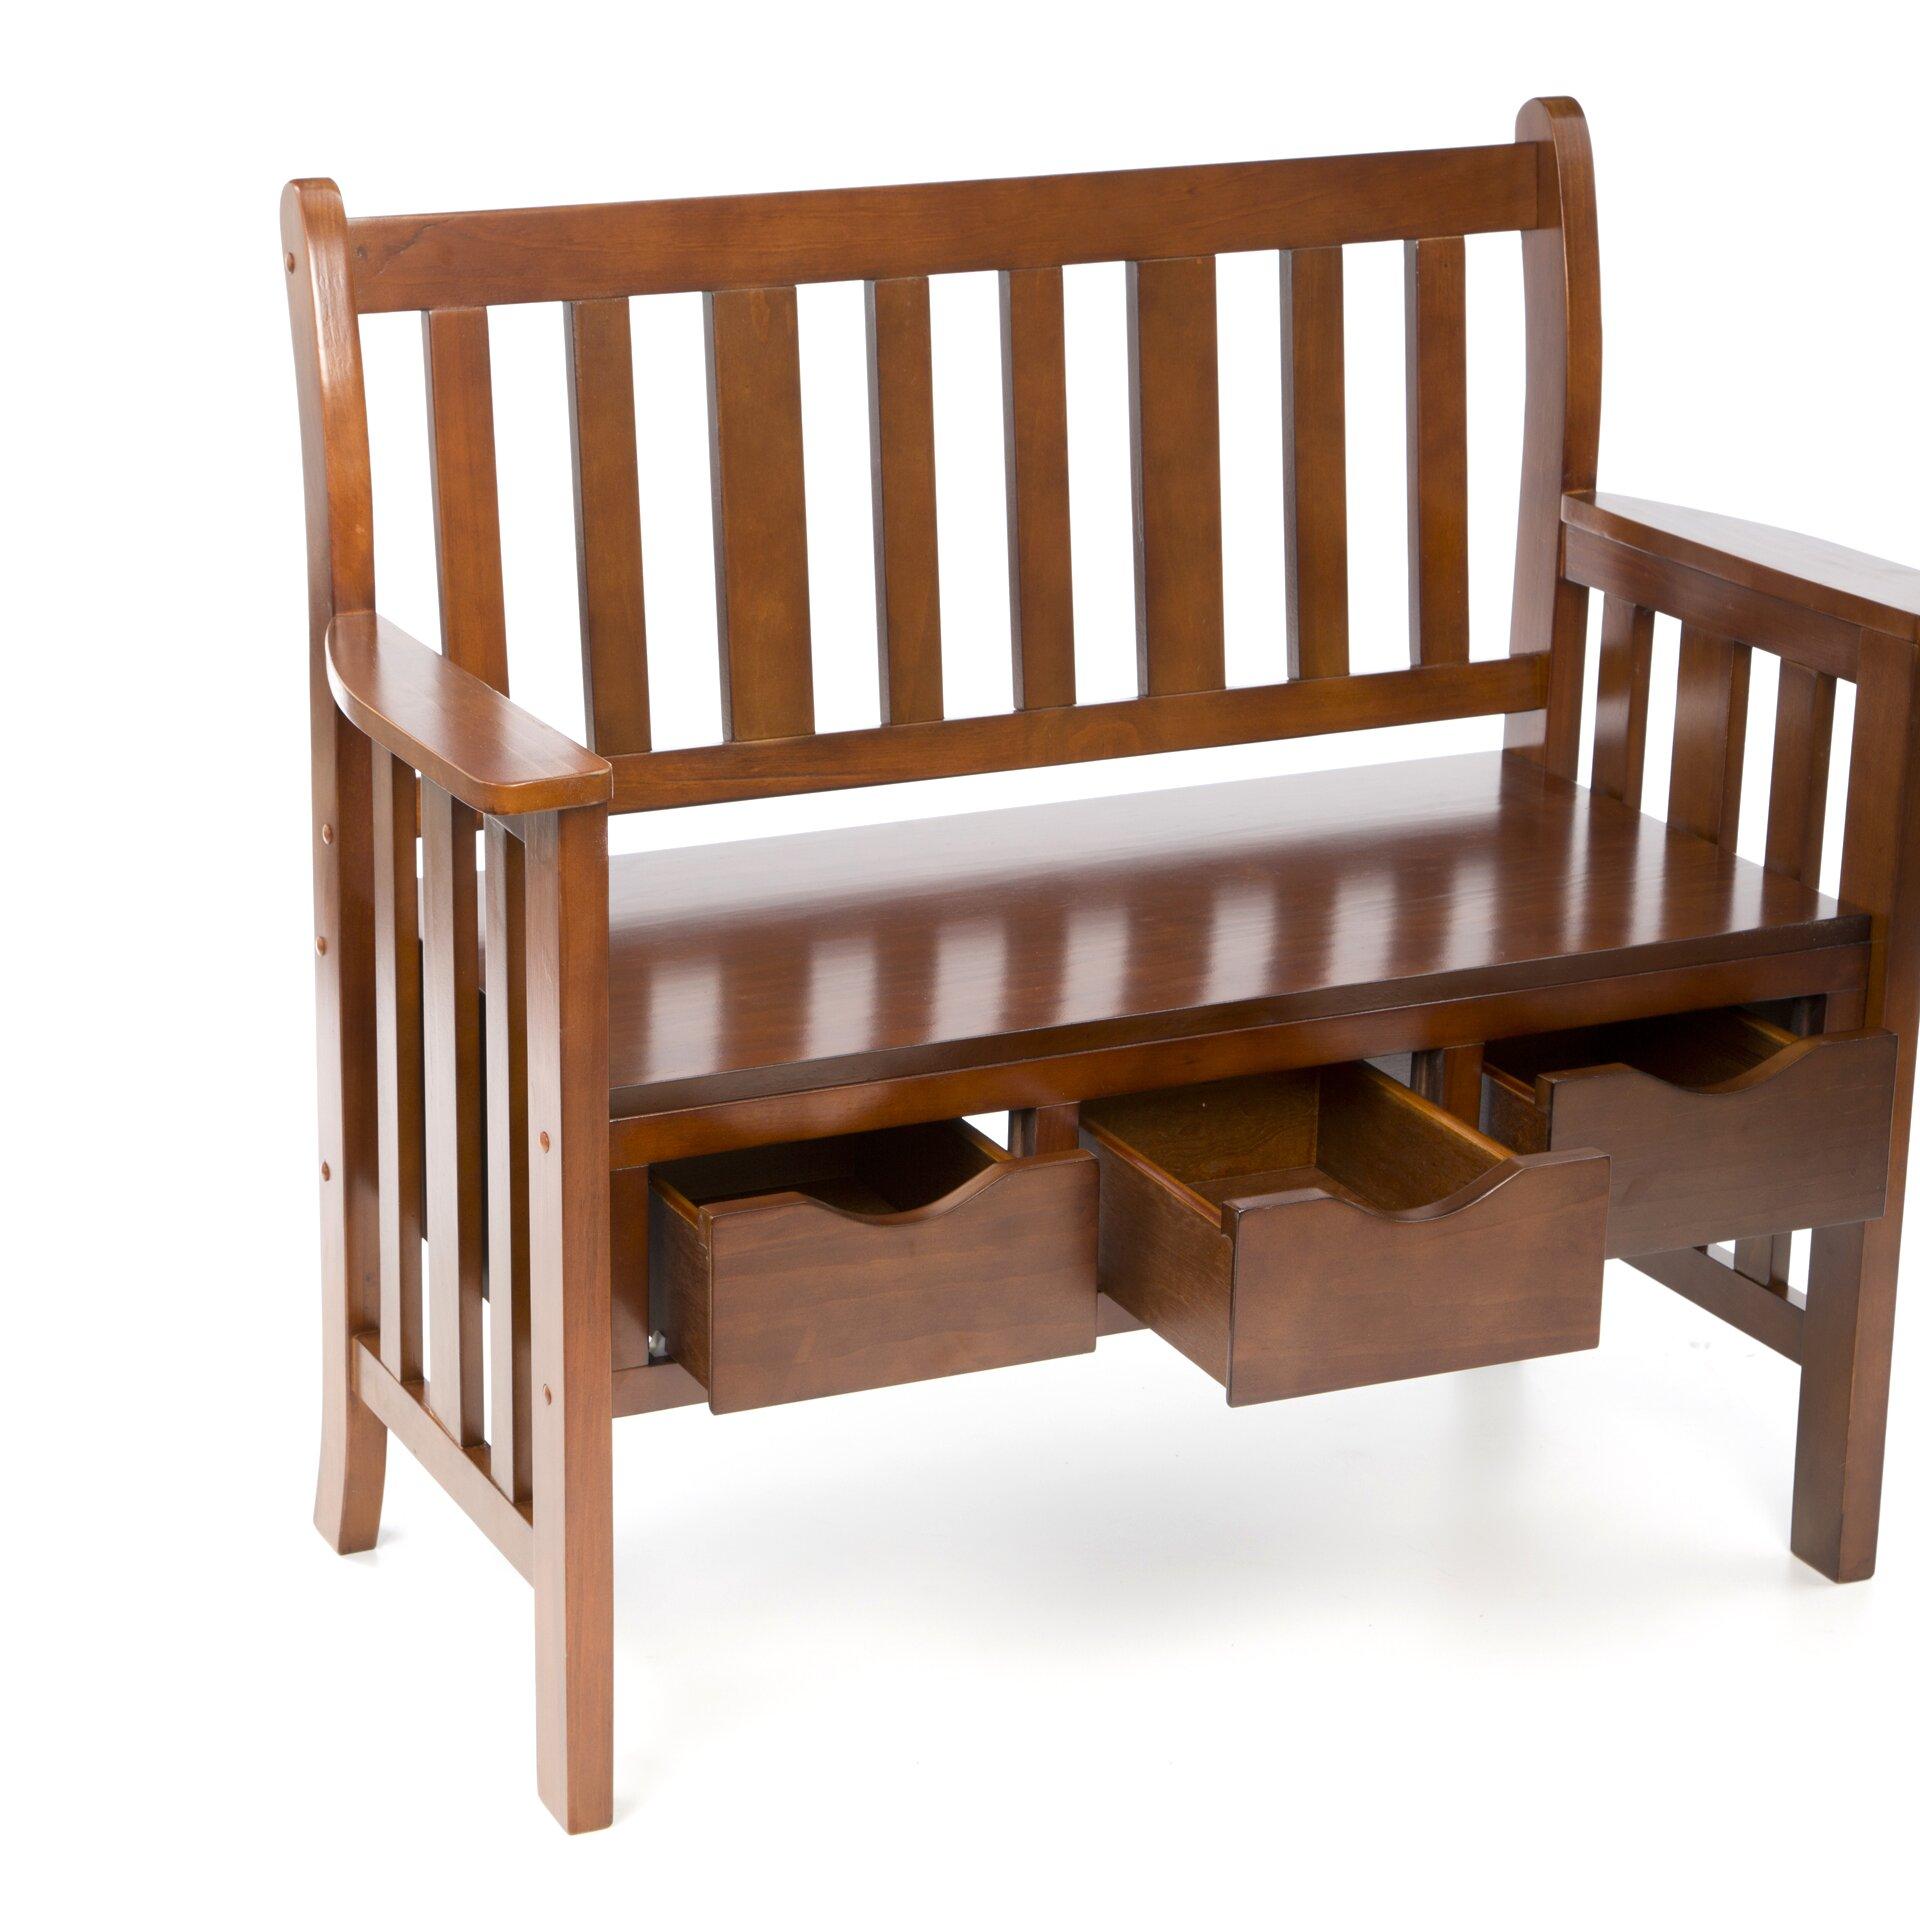 Foyer Bench Xl : Wildon home davidson storage wood entryway bench